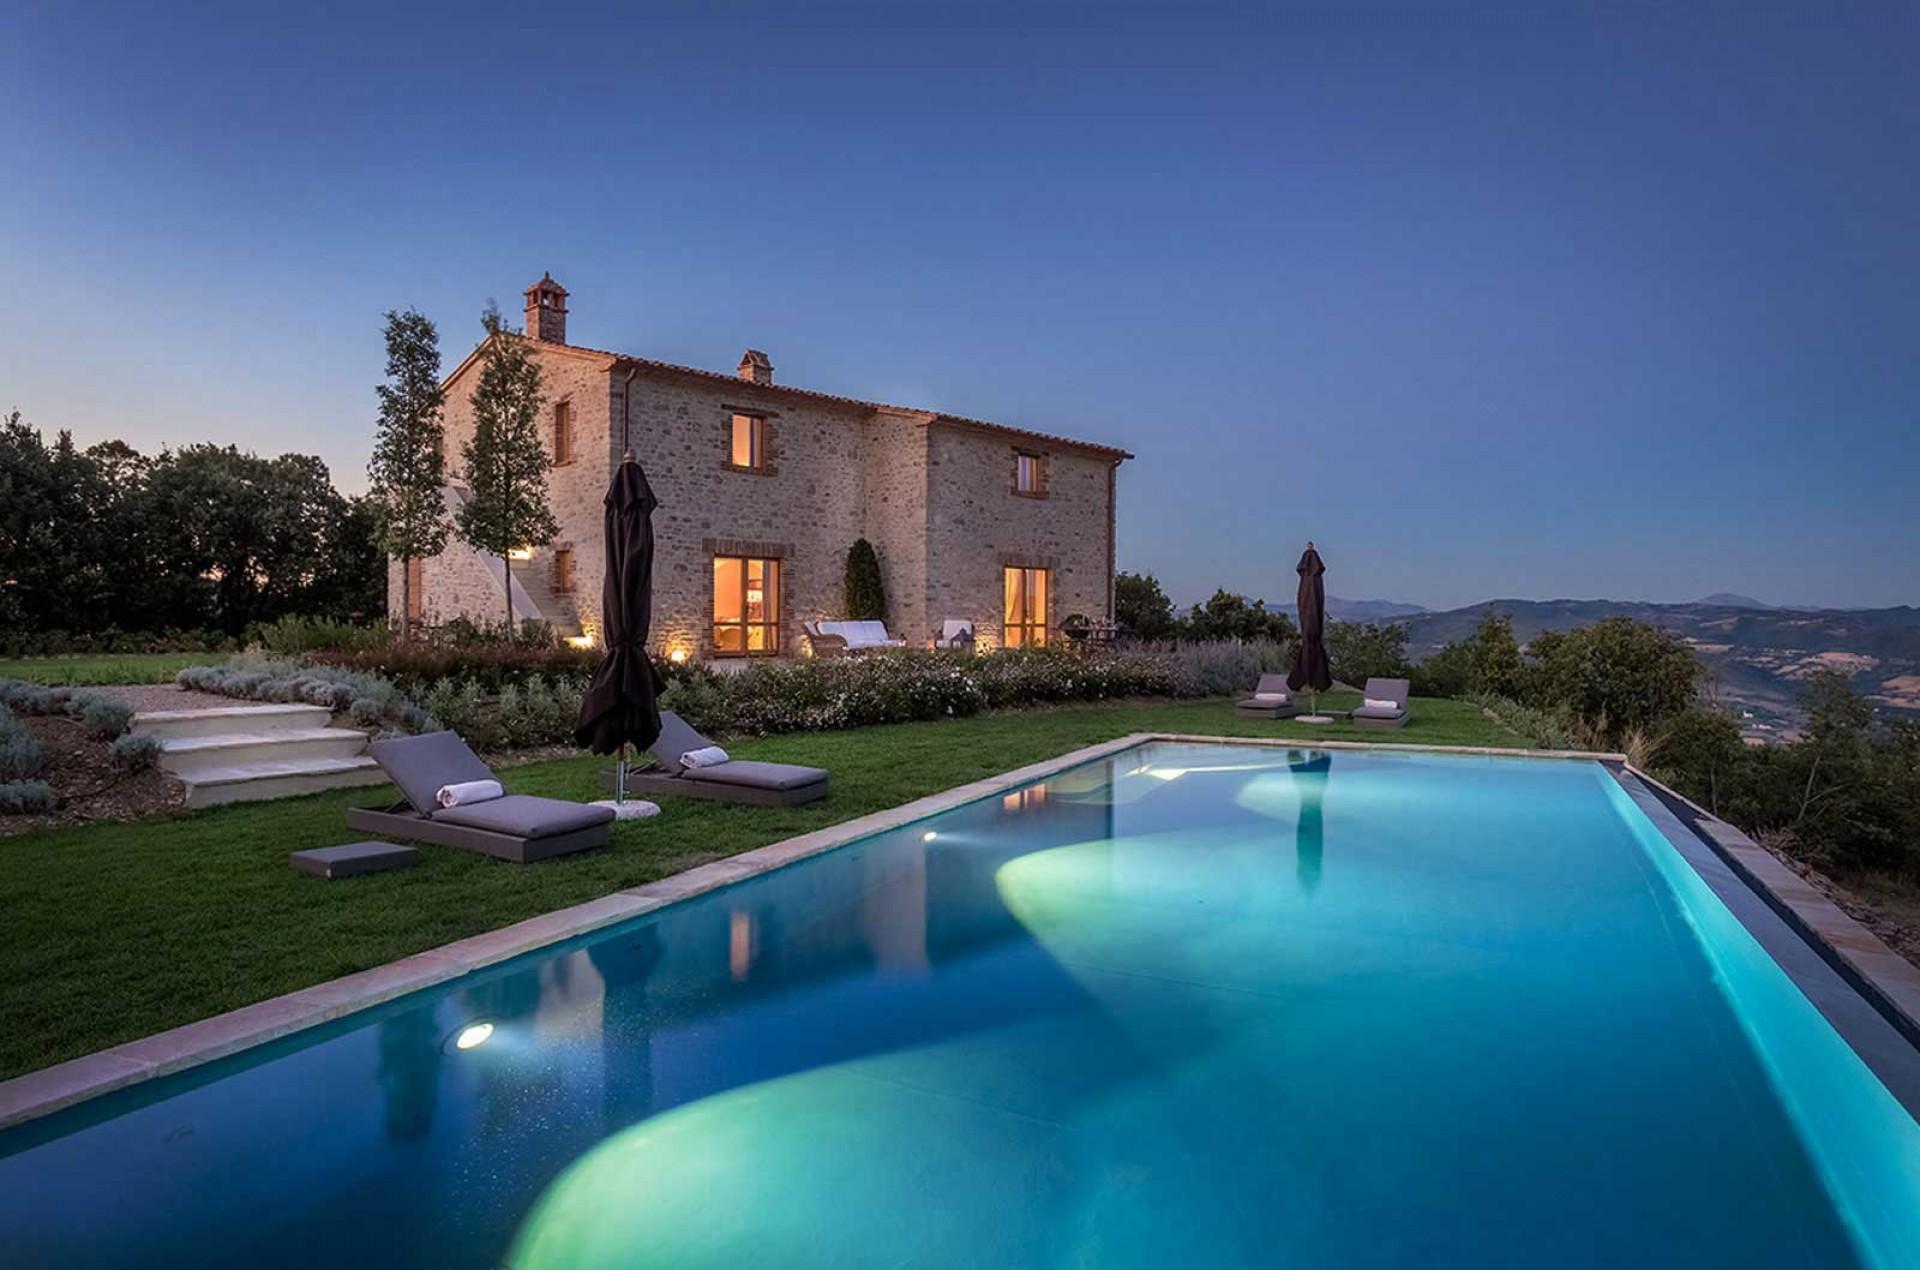 Best Kitchen Gallery: Umbria Villas Umbria Holiday Rentals Isle Blue of Tuscany Italy Villa Rentals  on rachelxblog.com